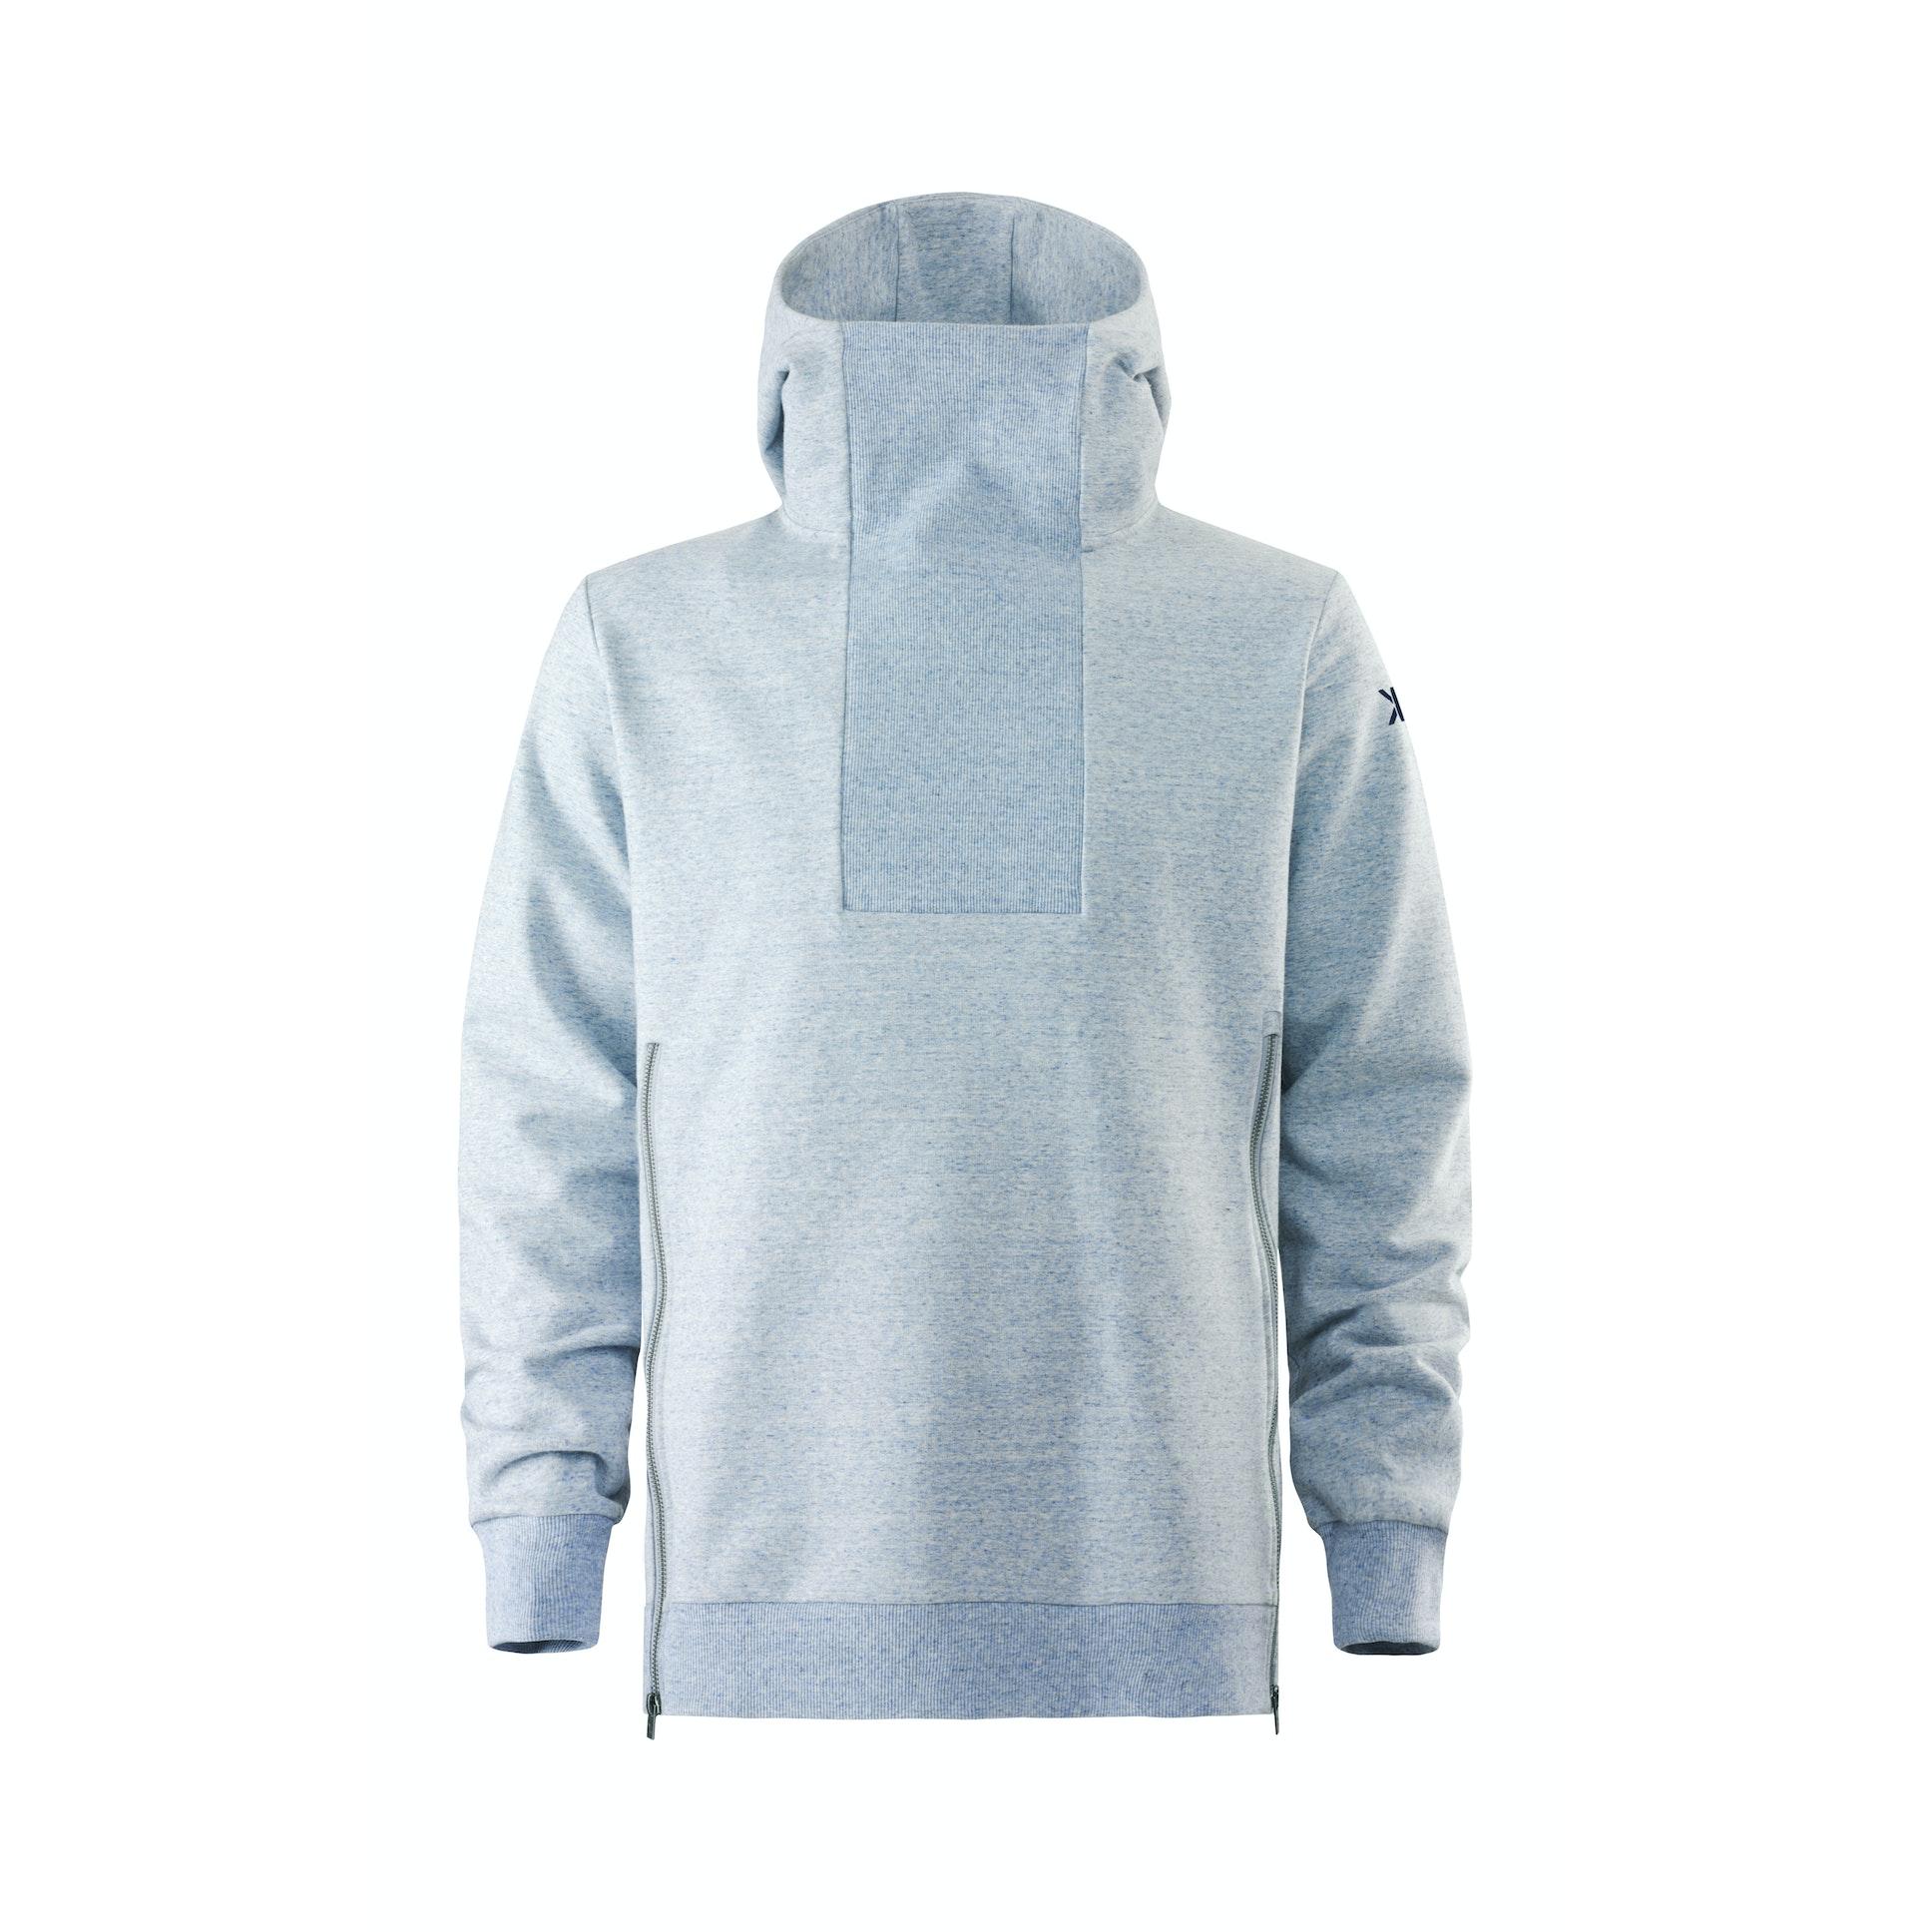 Light blue hoodies